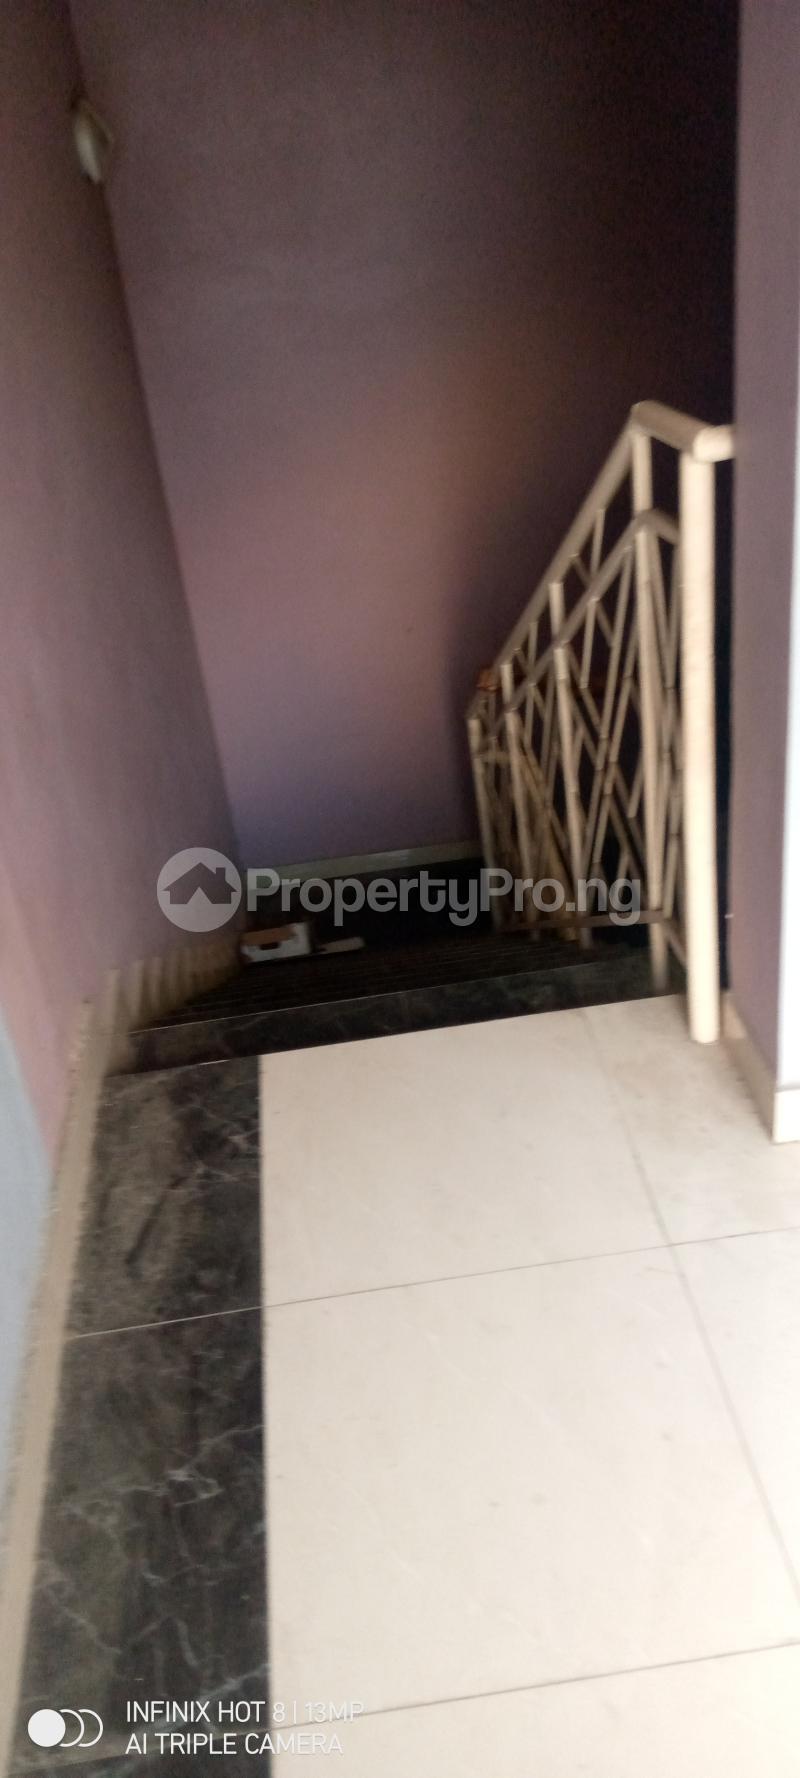 2 bedroom Flat / Apartment for rent Divine estate amuwo odofin Amuwo Odofin Lagos - 7